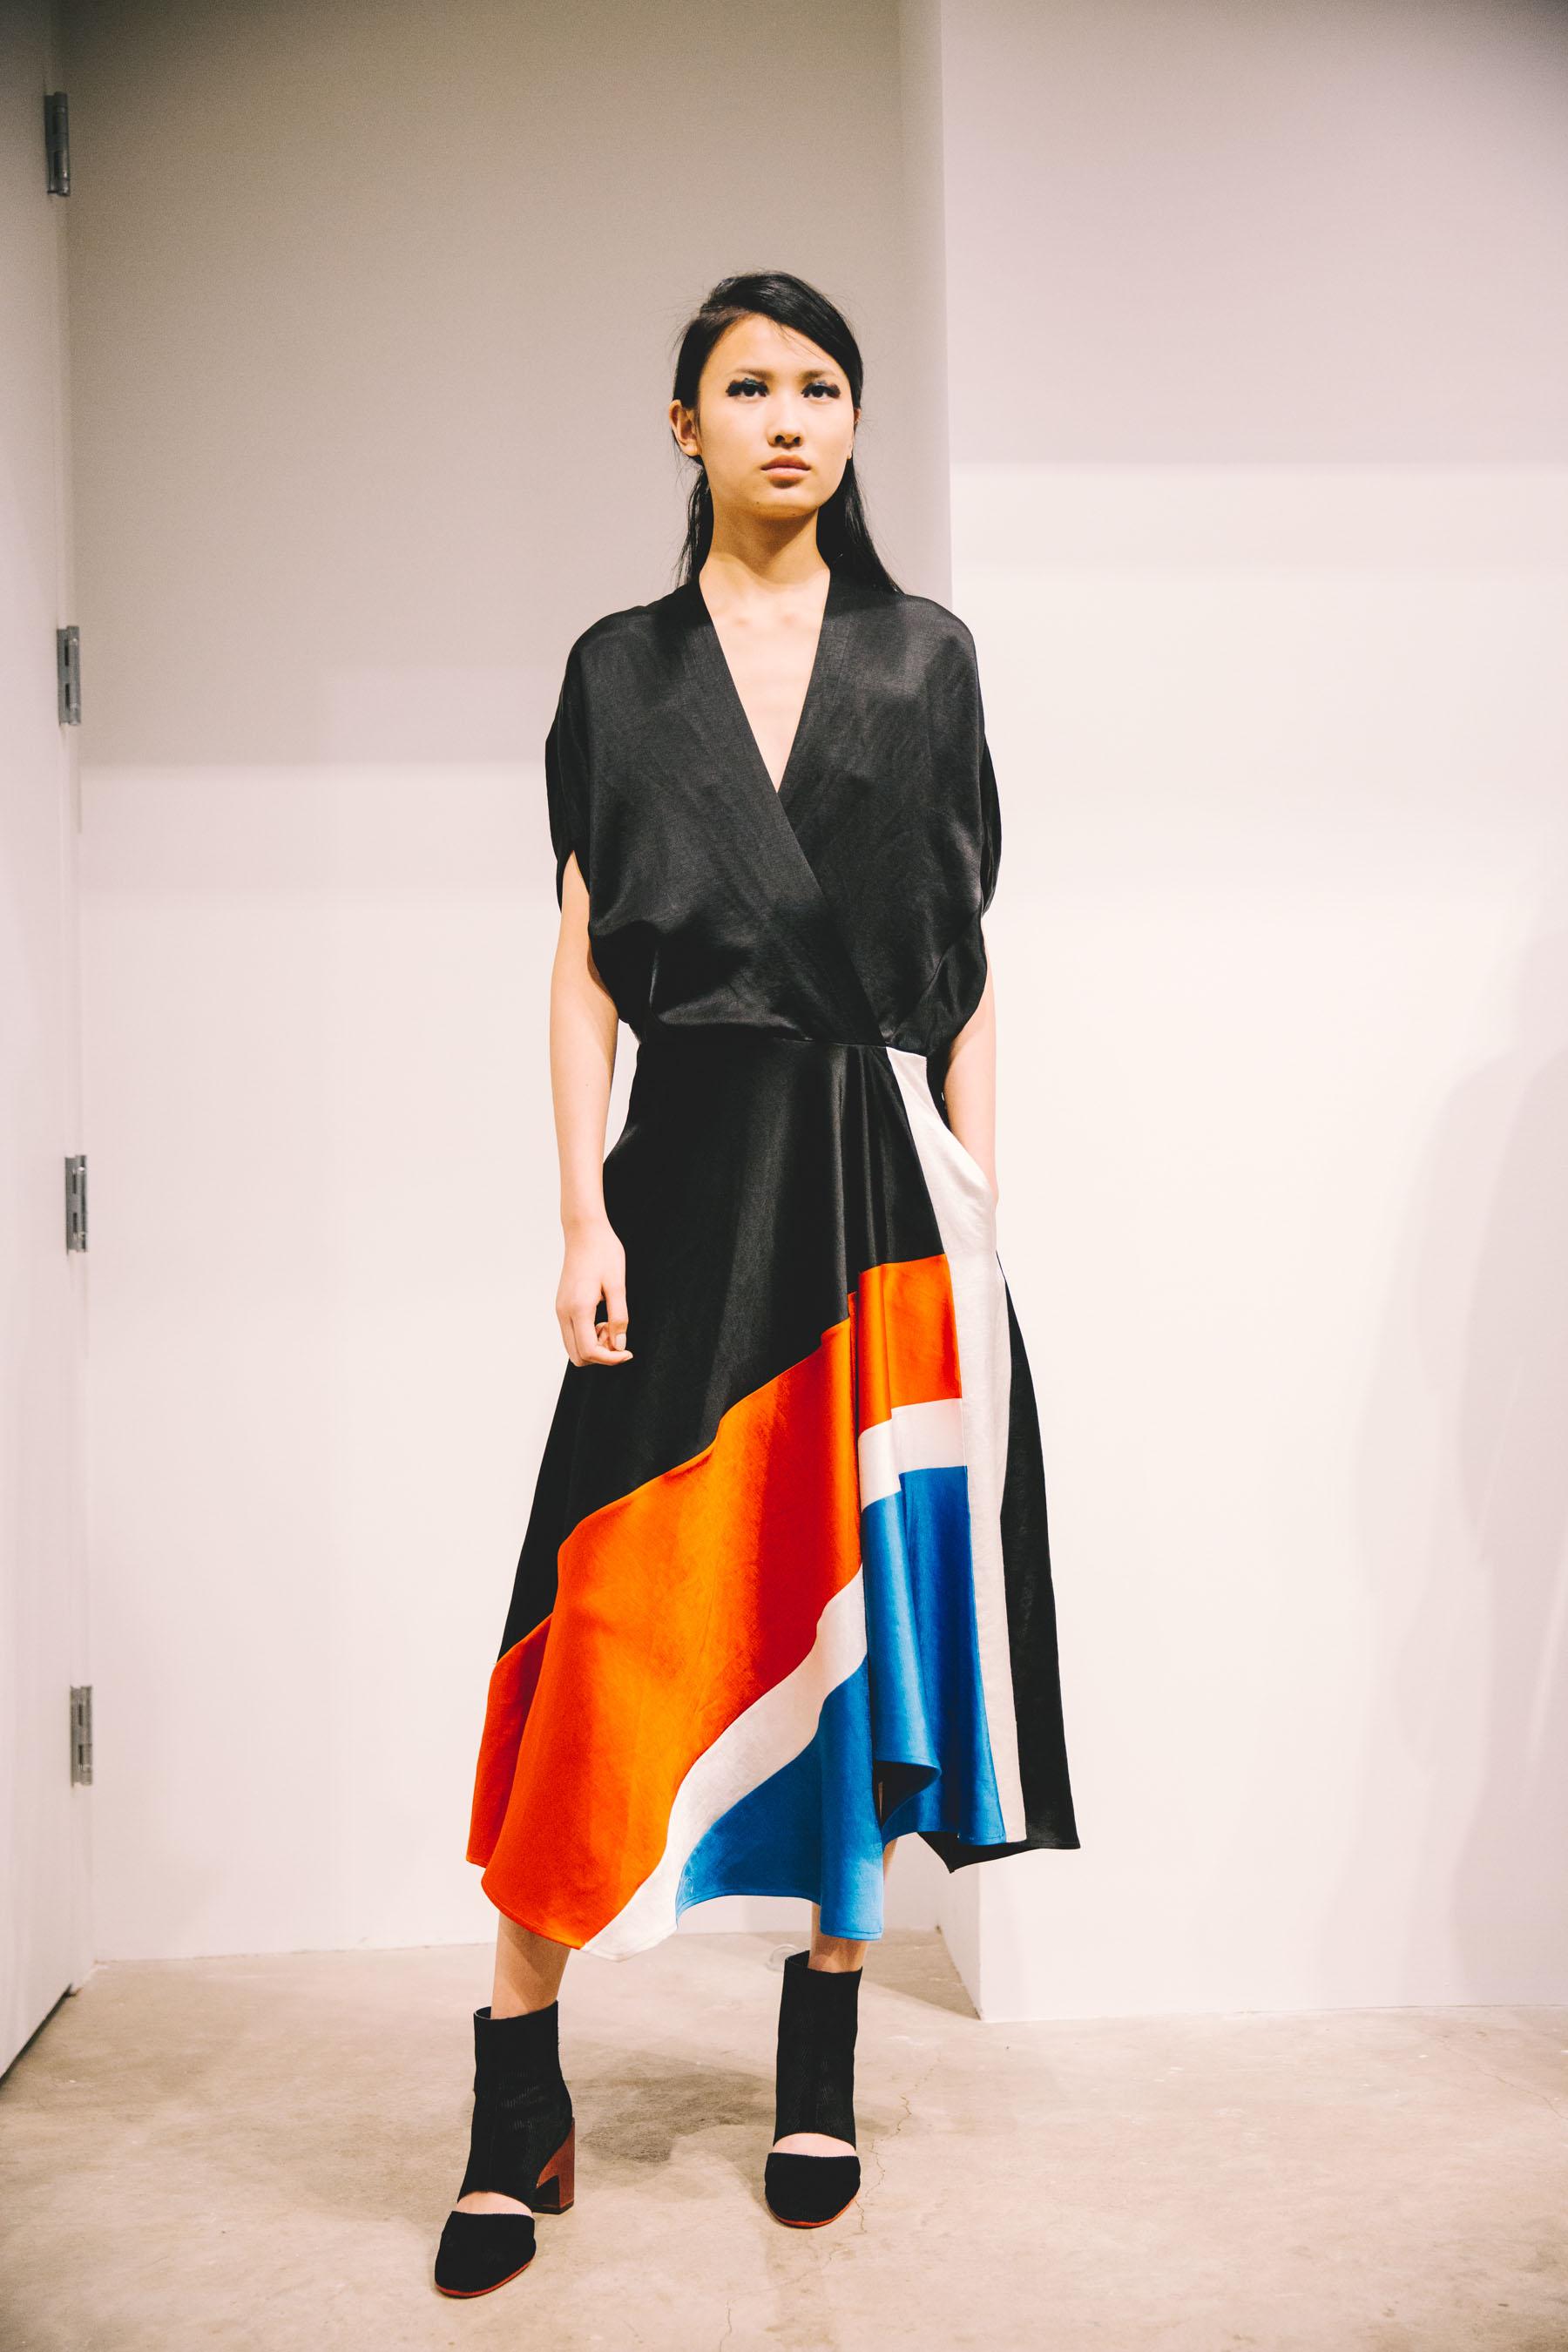 NYFW DAY 5 - Zero + Maria Cornejo Fall 2018 Collection // Notjessfashion.com